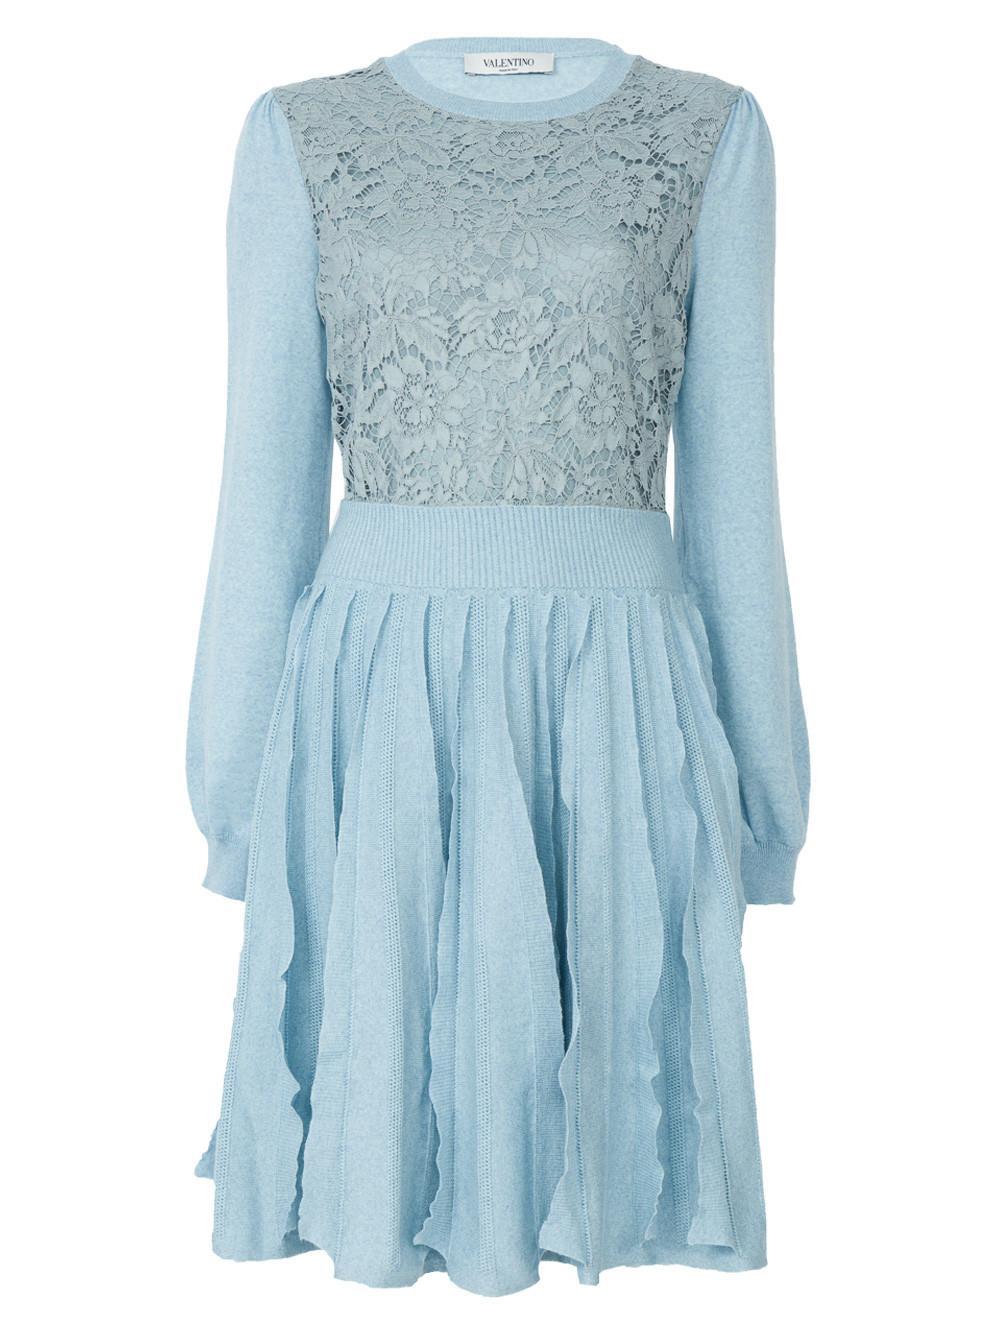 Valentino Blue Abito Dress